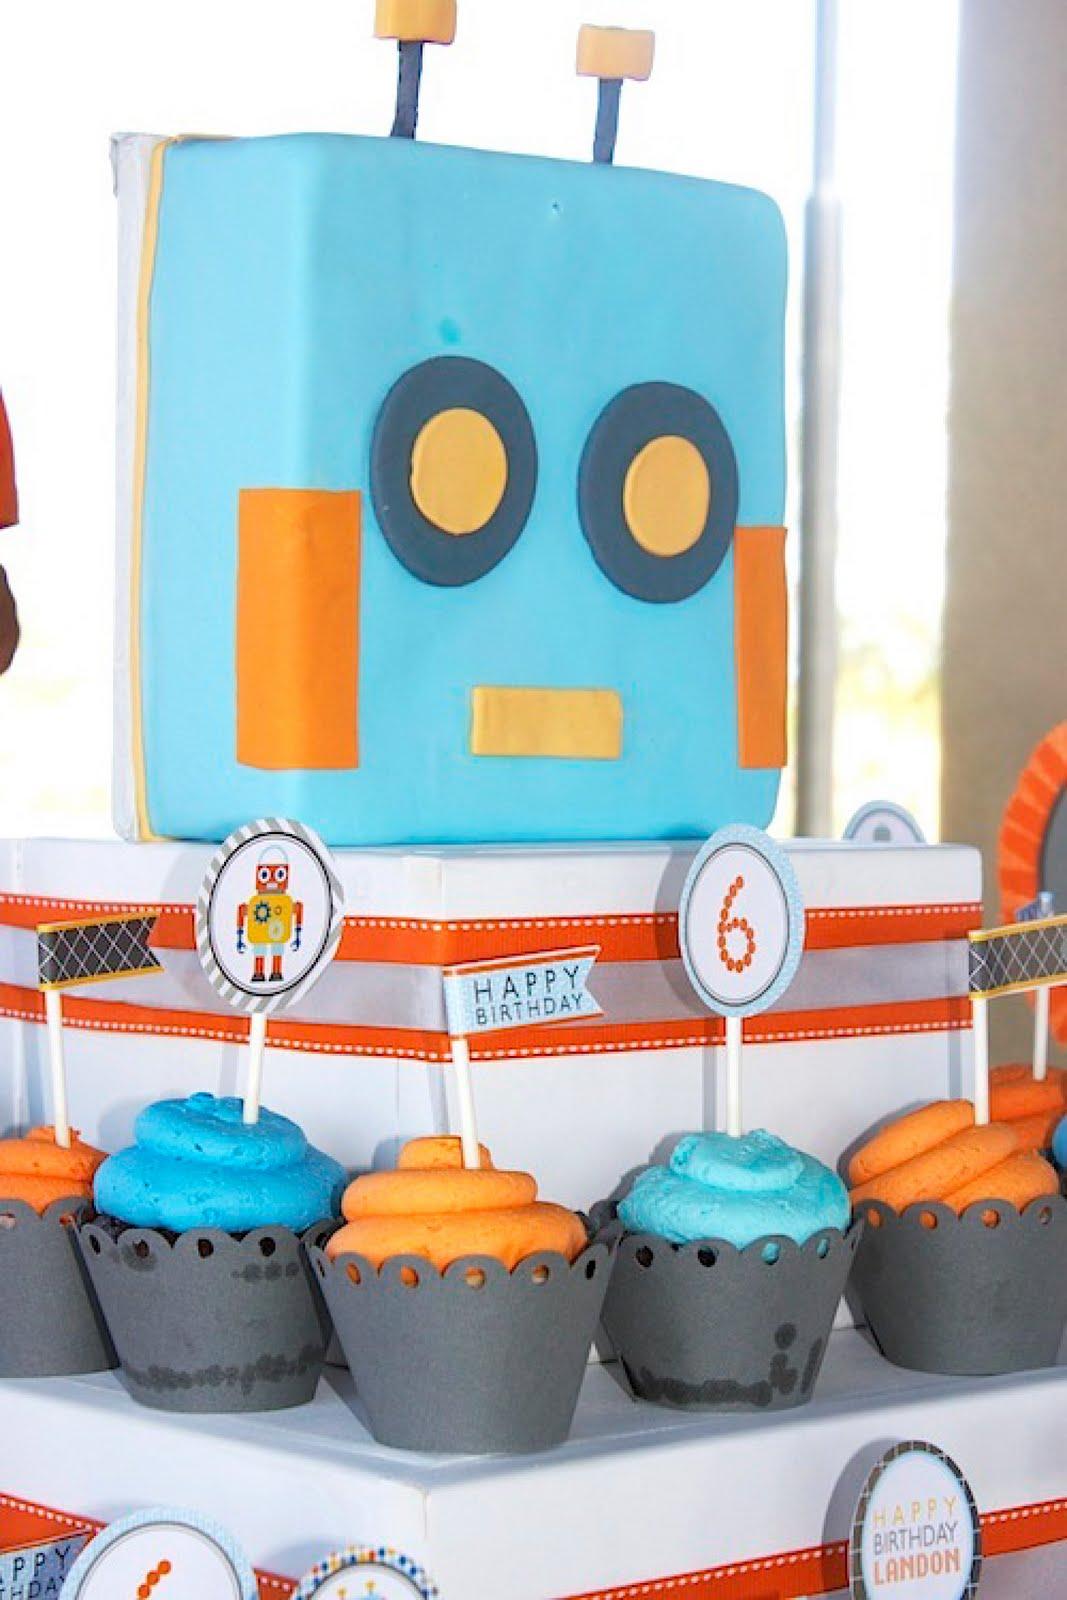 A Robo Tastic Robot Party Anders Ruff Custom Designs Llc